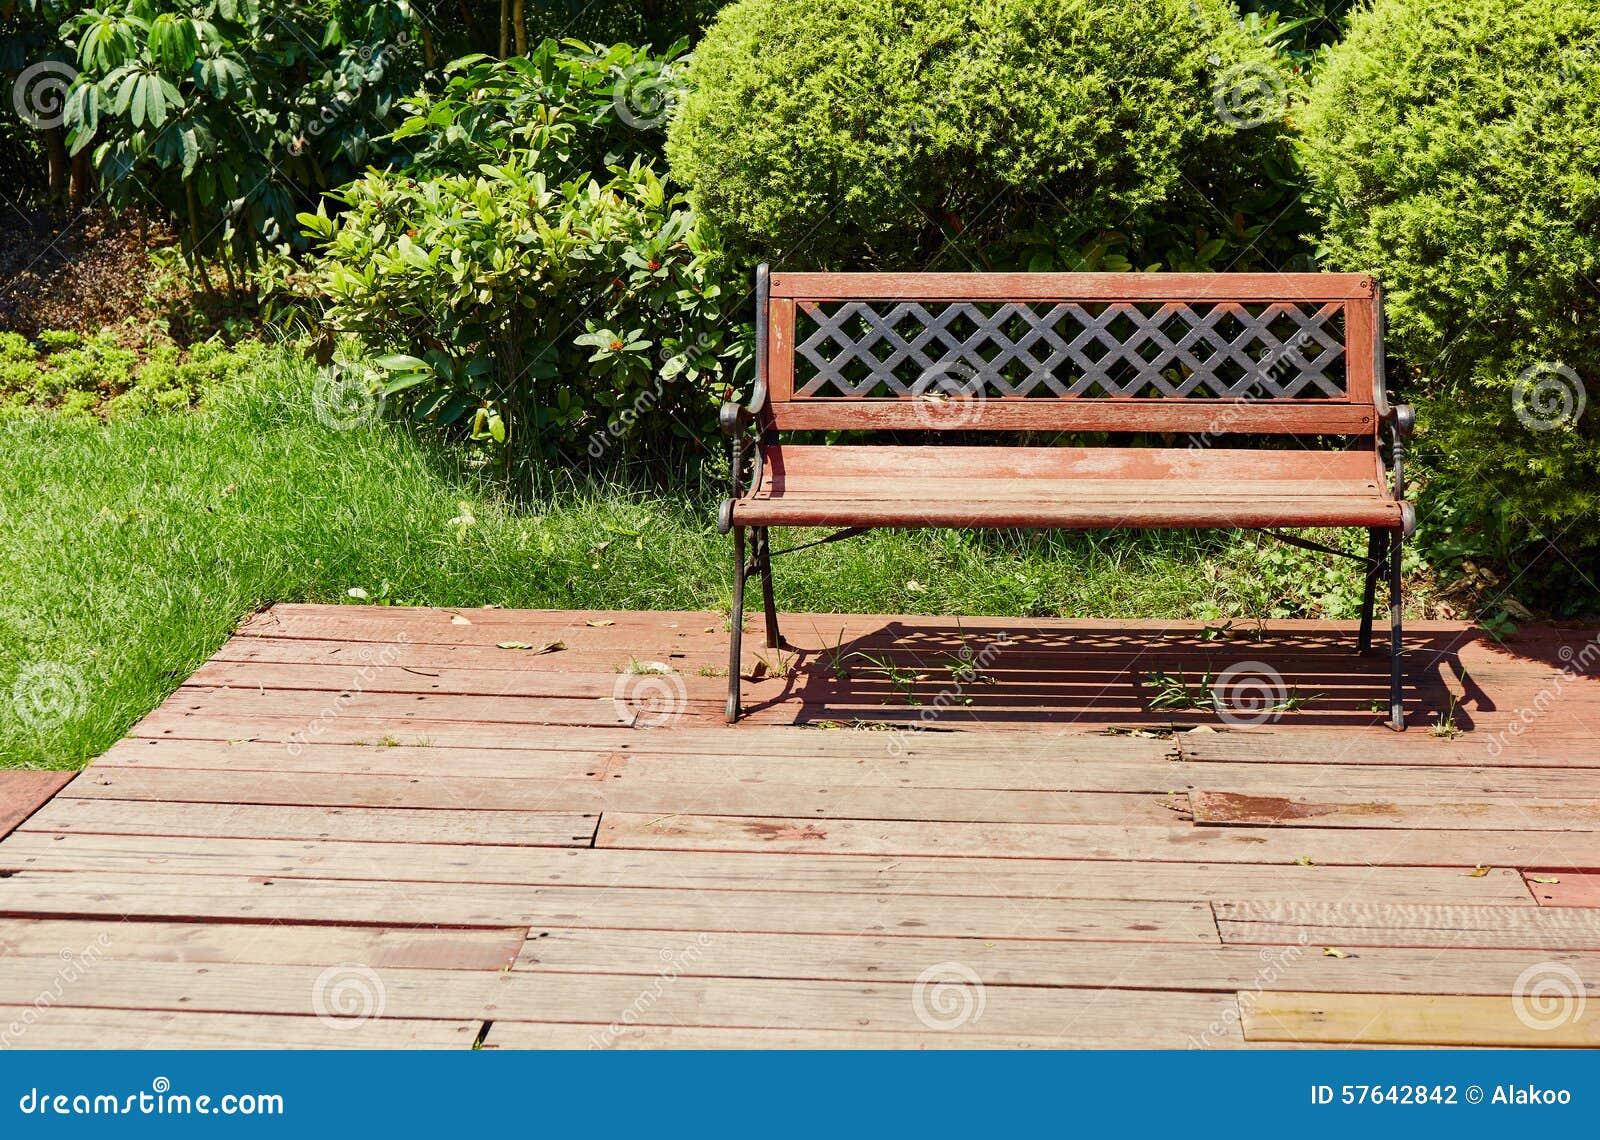 Chair On Wooden Deck Wood Outdoor Patio Backyard Garden